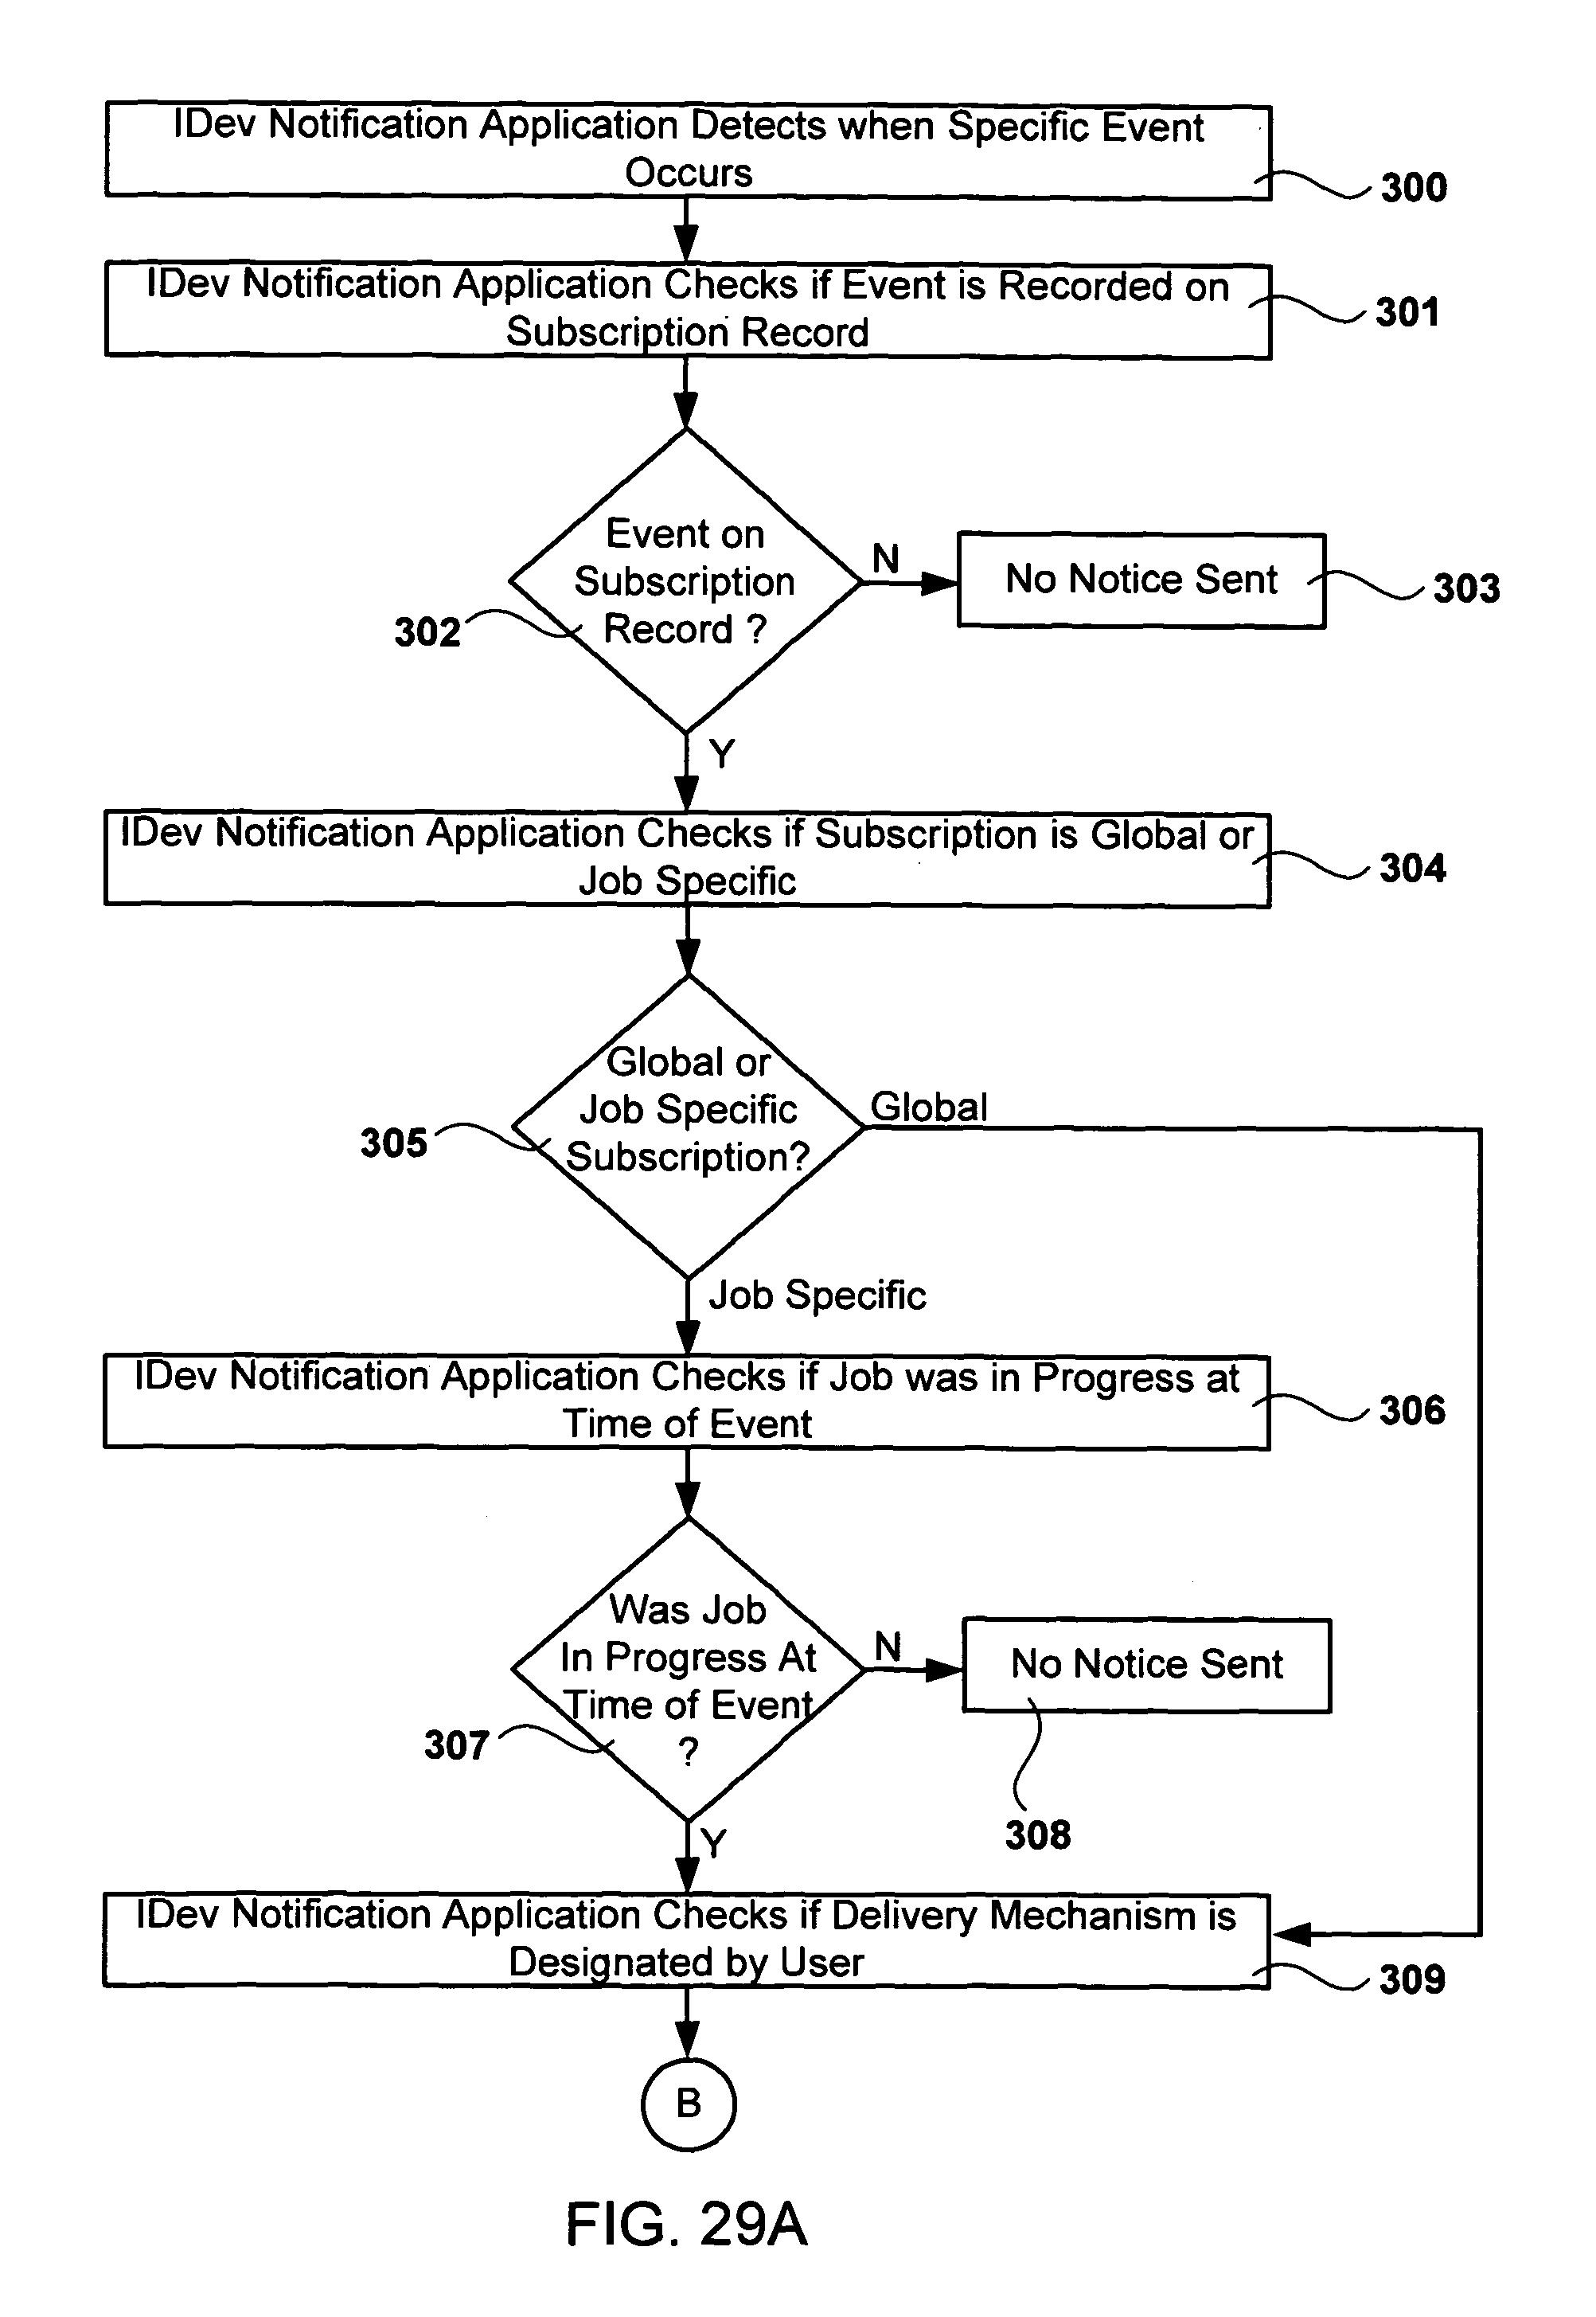 Patent US 8,032,608 B2